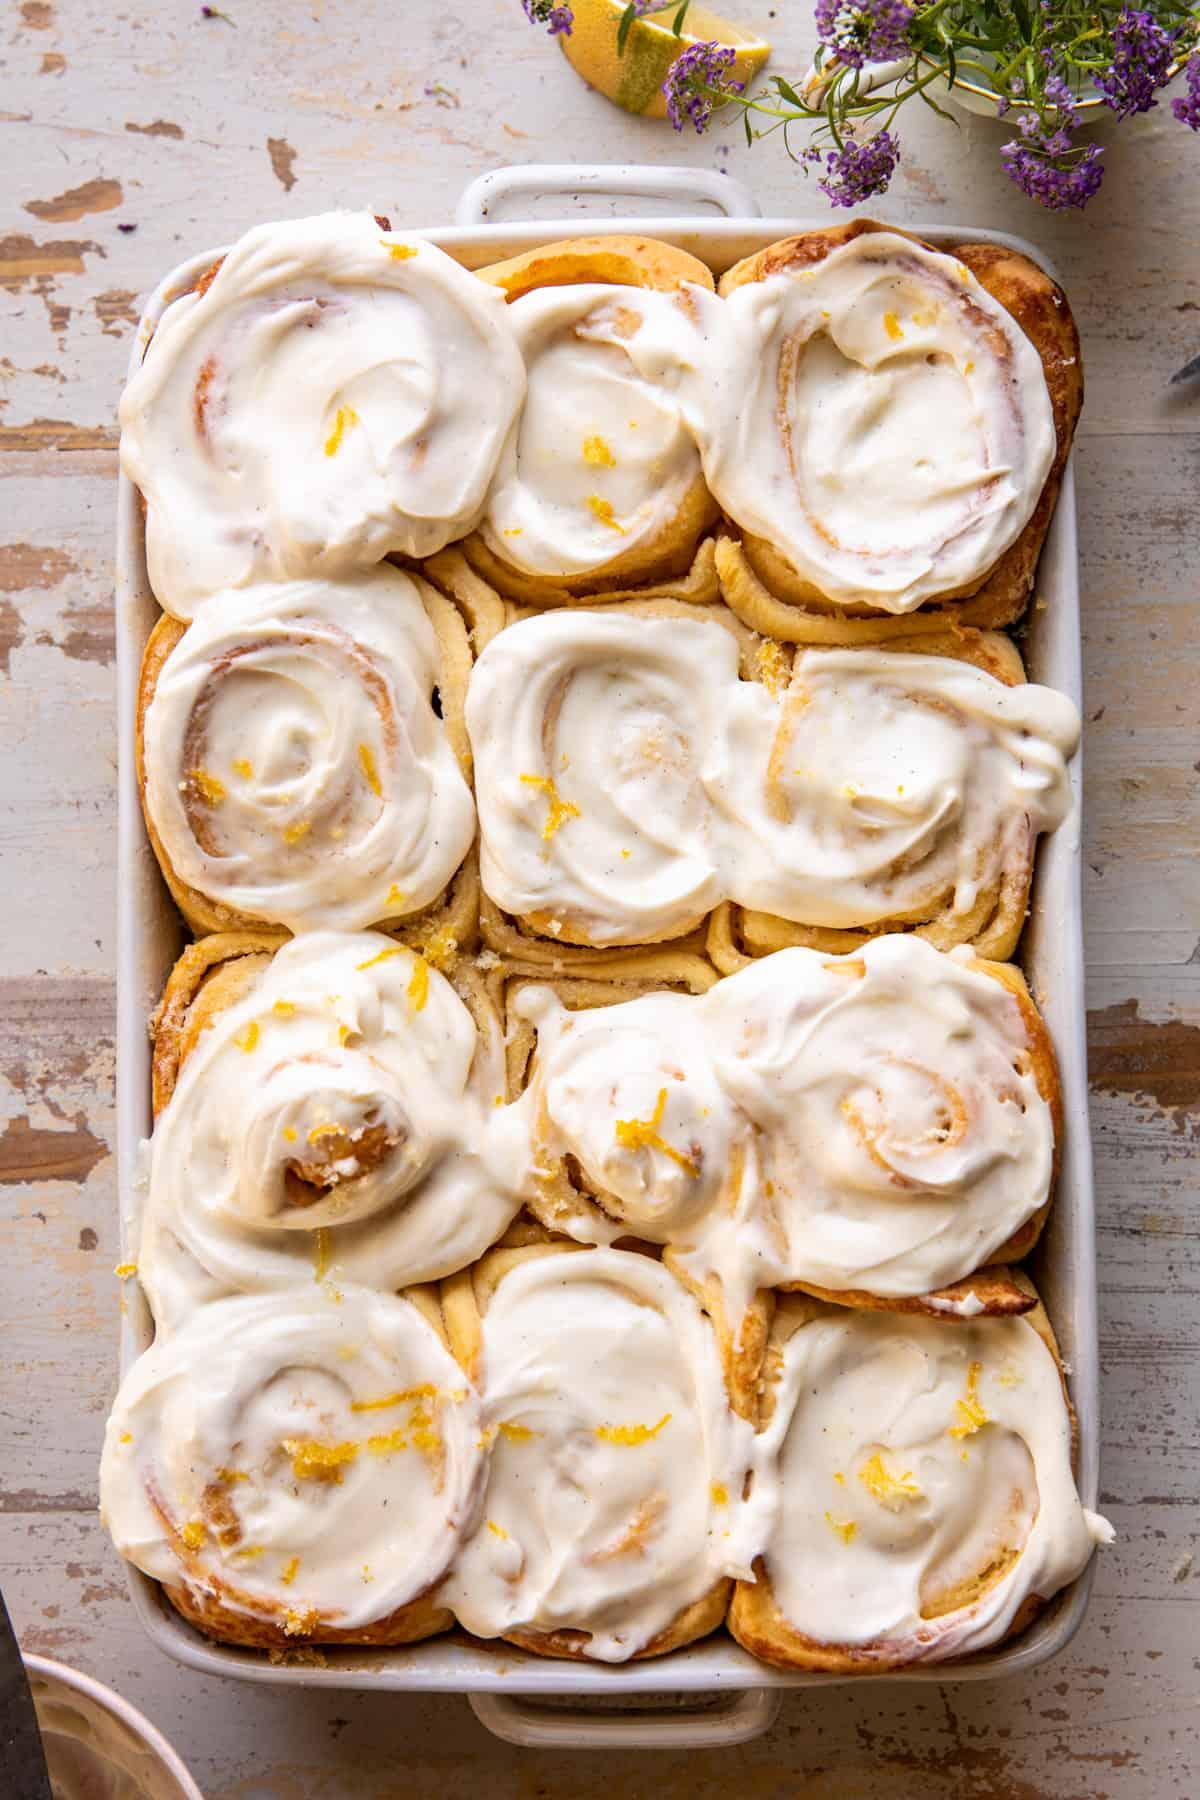 Lemon Sugar Rolls With Vanilla Cream Cheese Icing. - Half Baked Harvest Lemon Sugar Rolls With Vanilla Cream Cheese Icing.